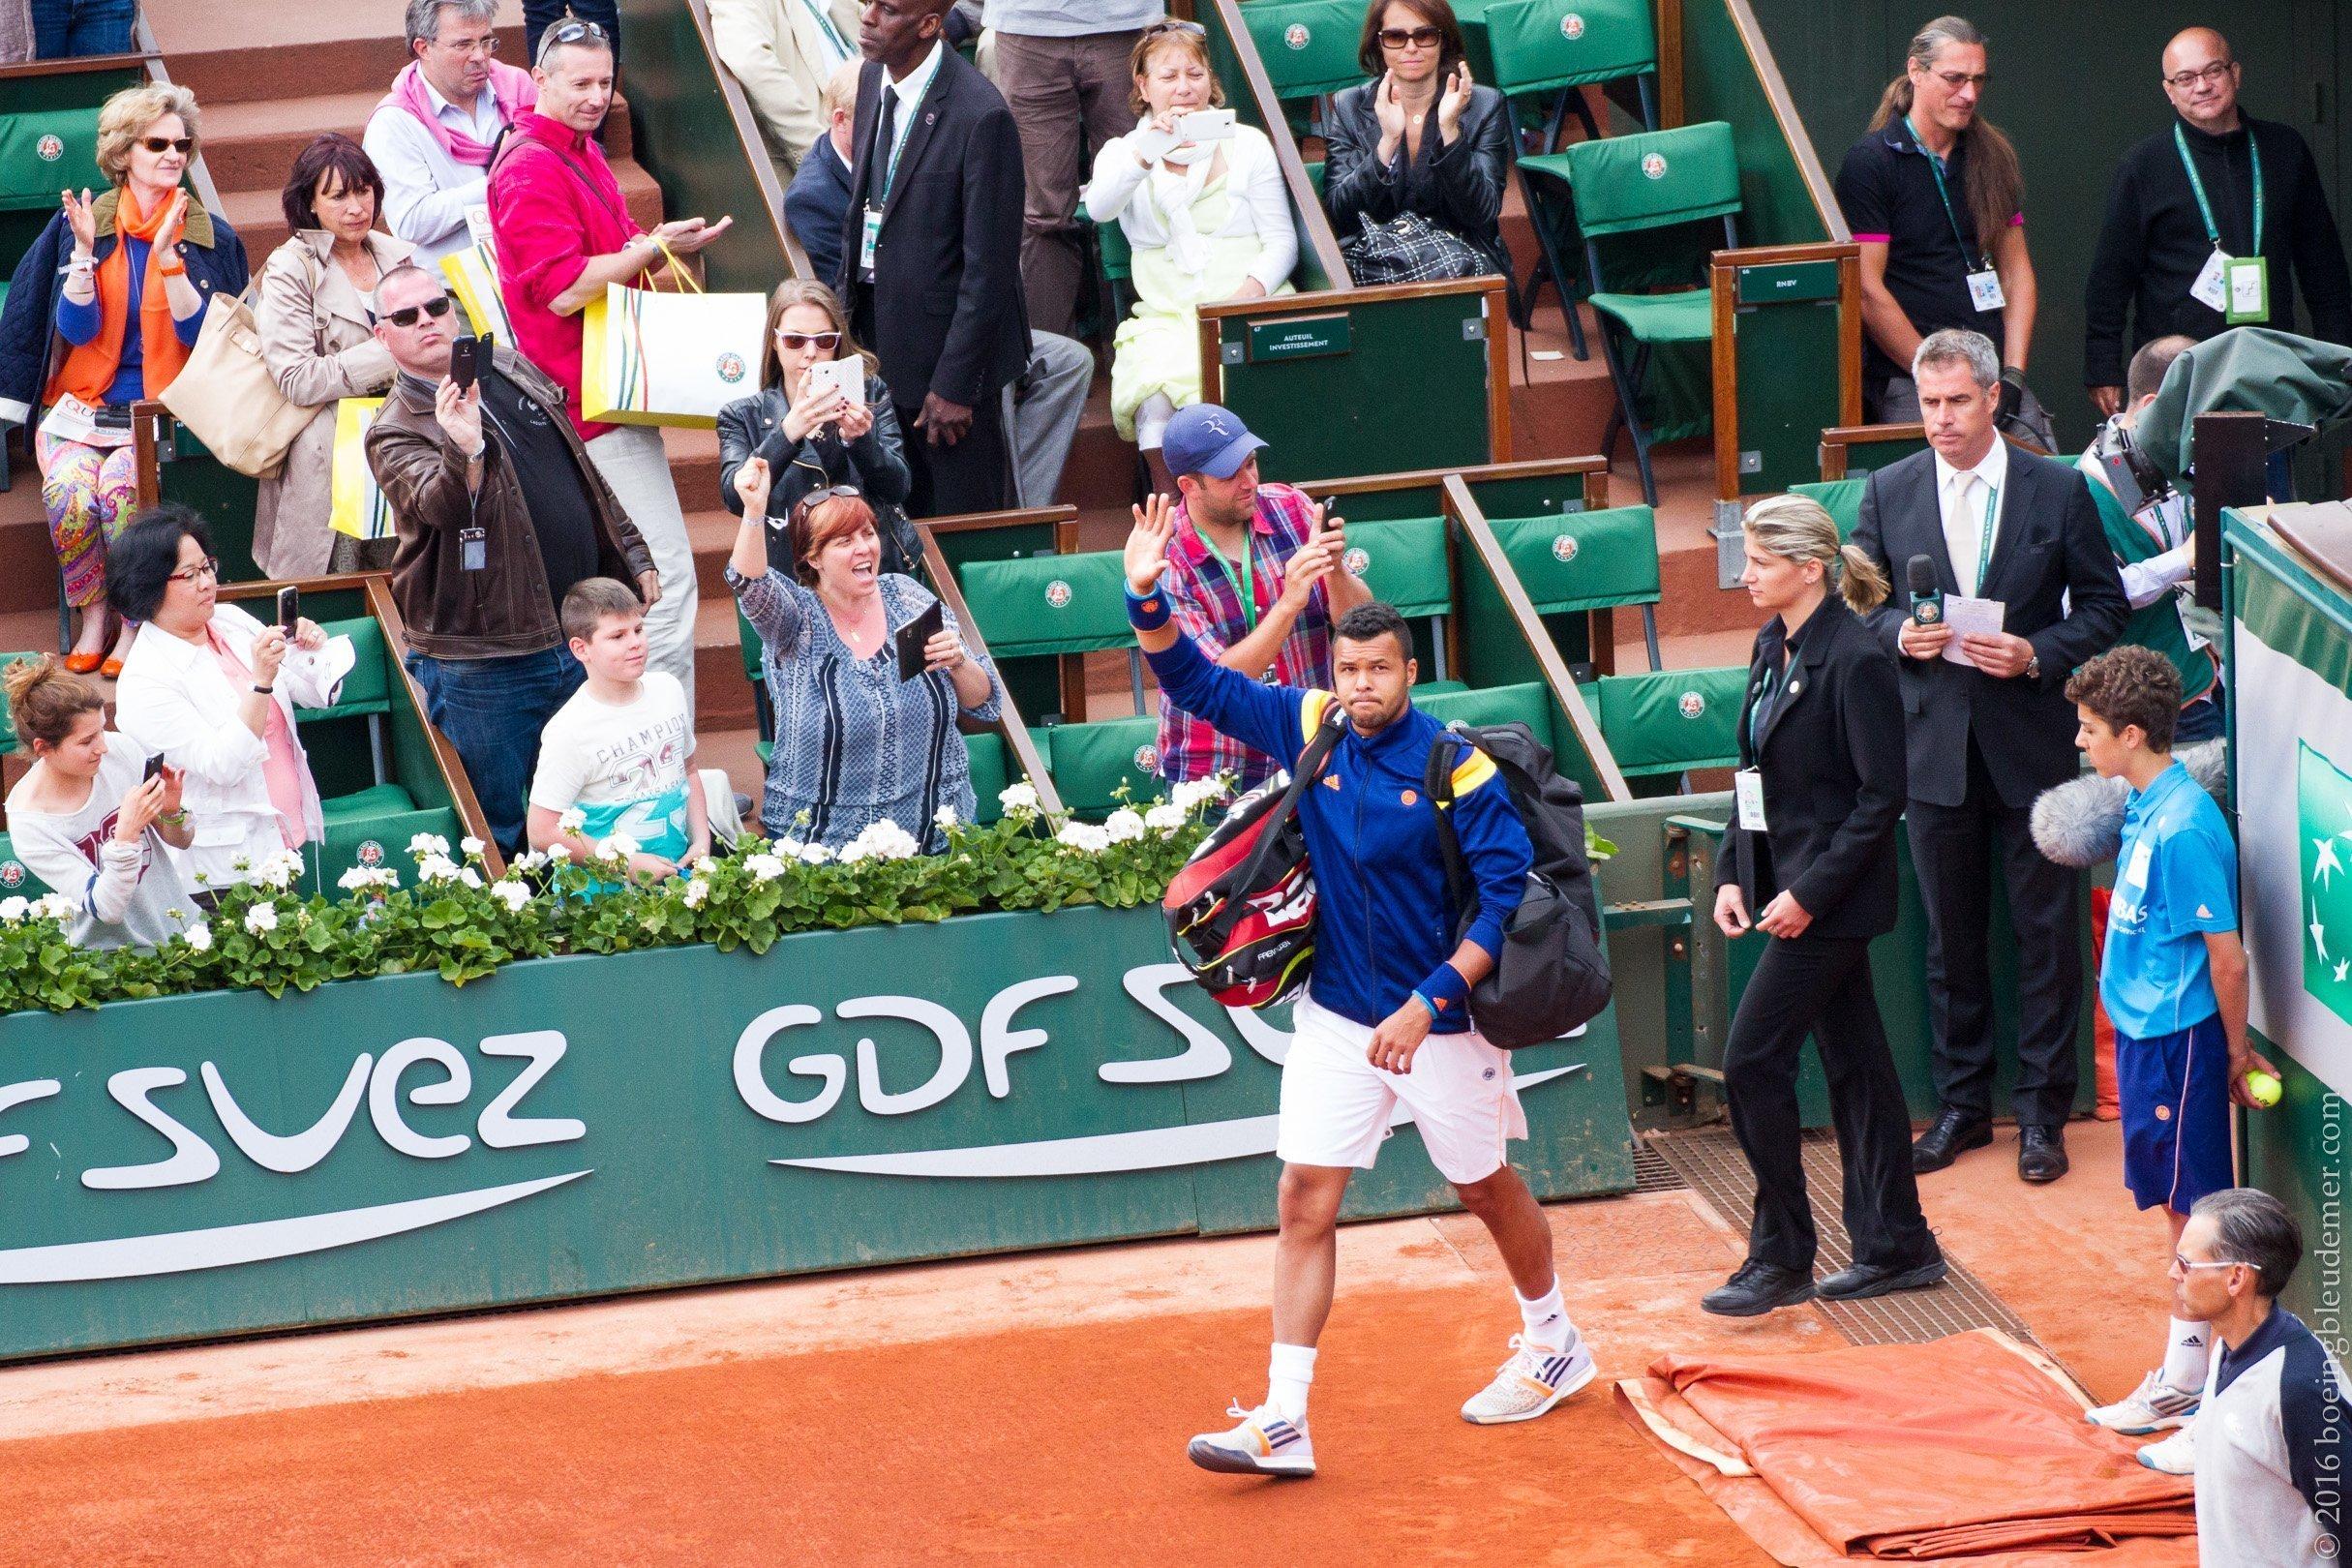 Roland Garros: Jo-Wilfried Tsonga